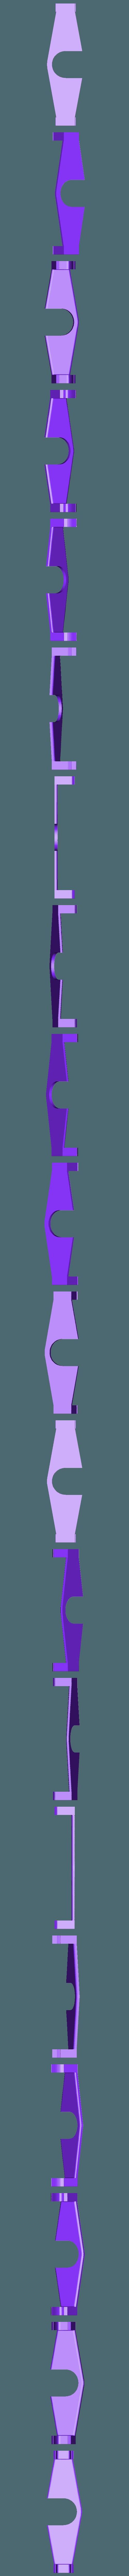 Rotor2.stl Download free STL file basic electric generator • 3D printable design, lukeskymuh